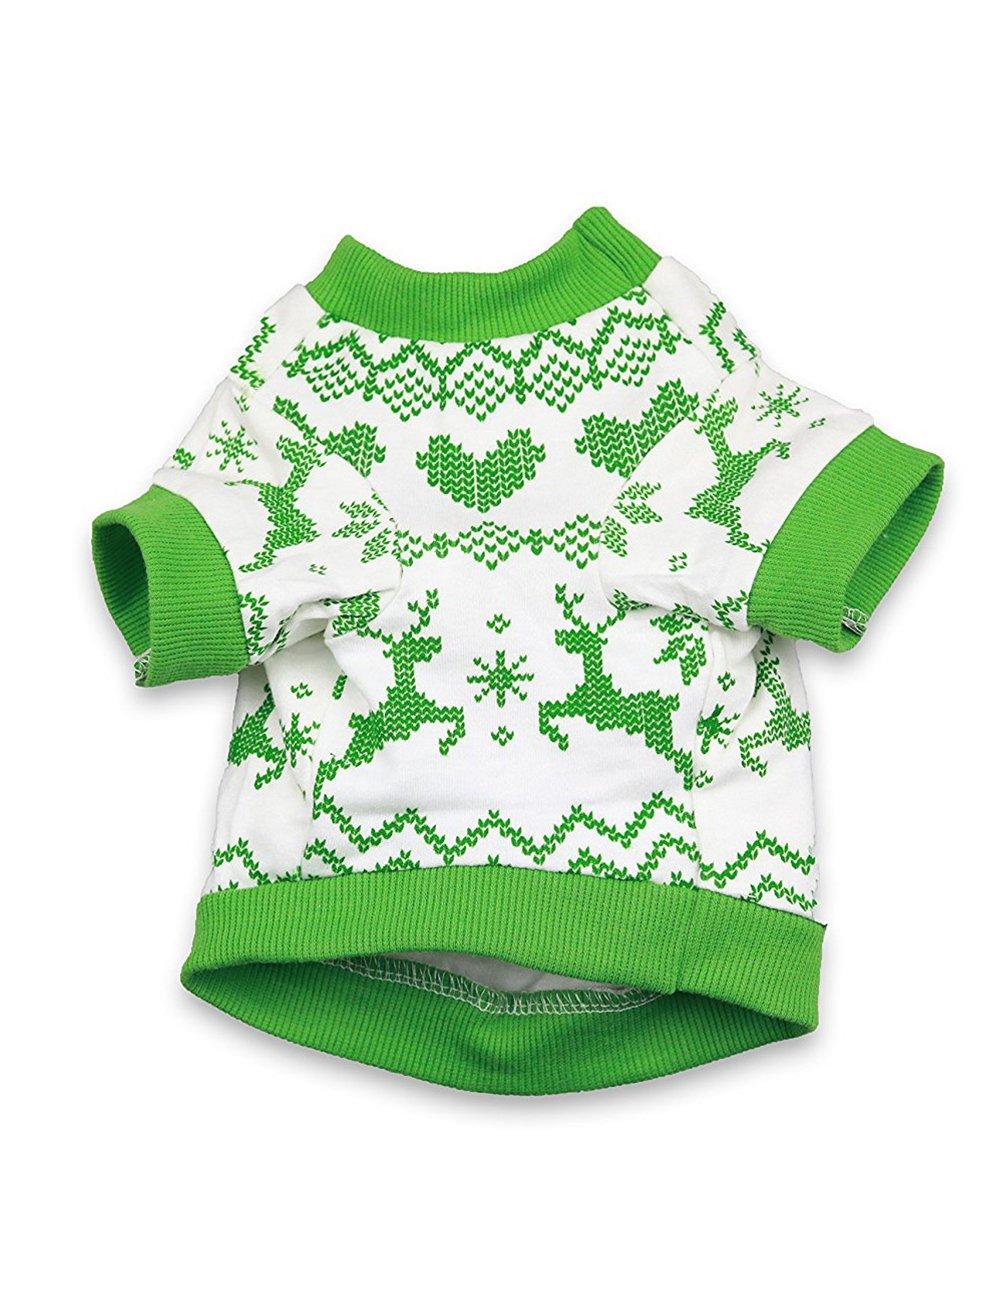 DroolingDog Dog Christmas Shirts Puppy T Shirt Dog Xmas Clothes for Small Dogs Green Small